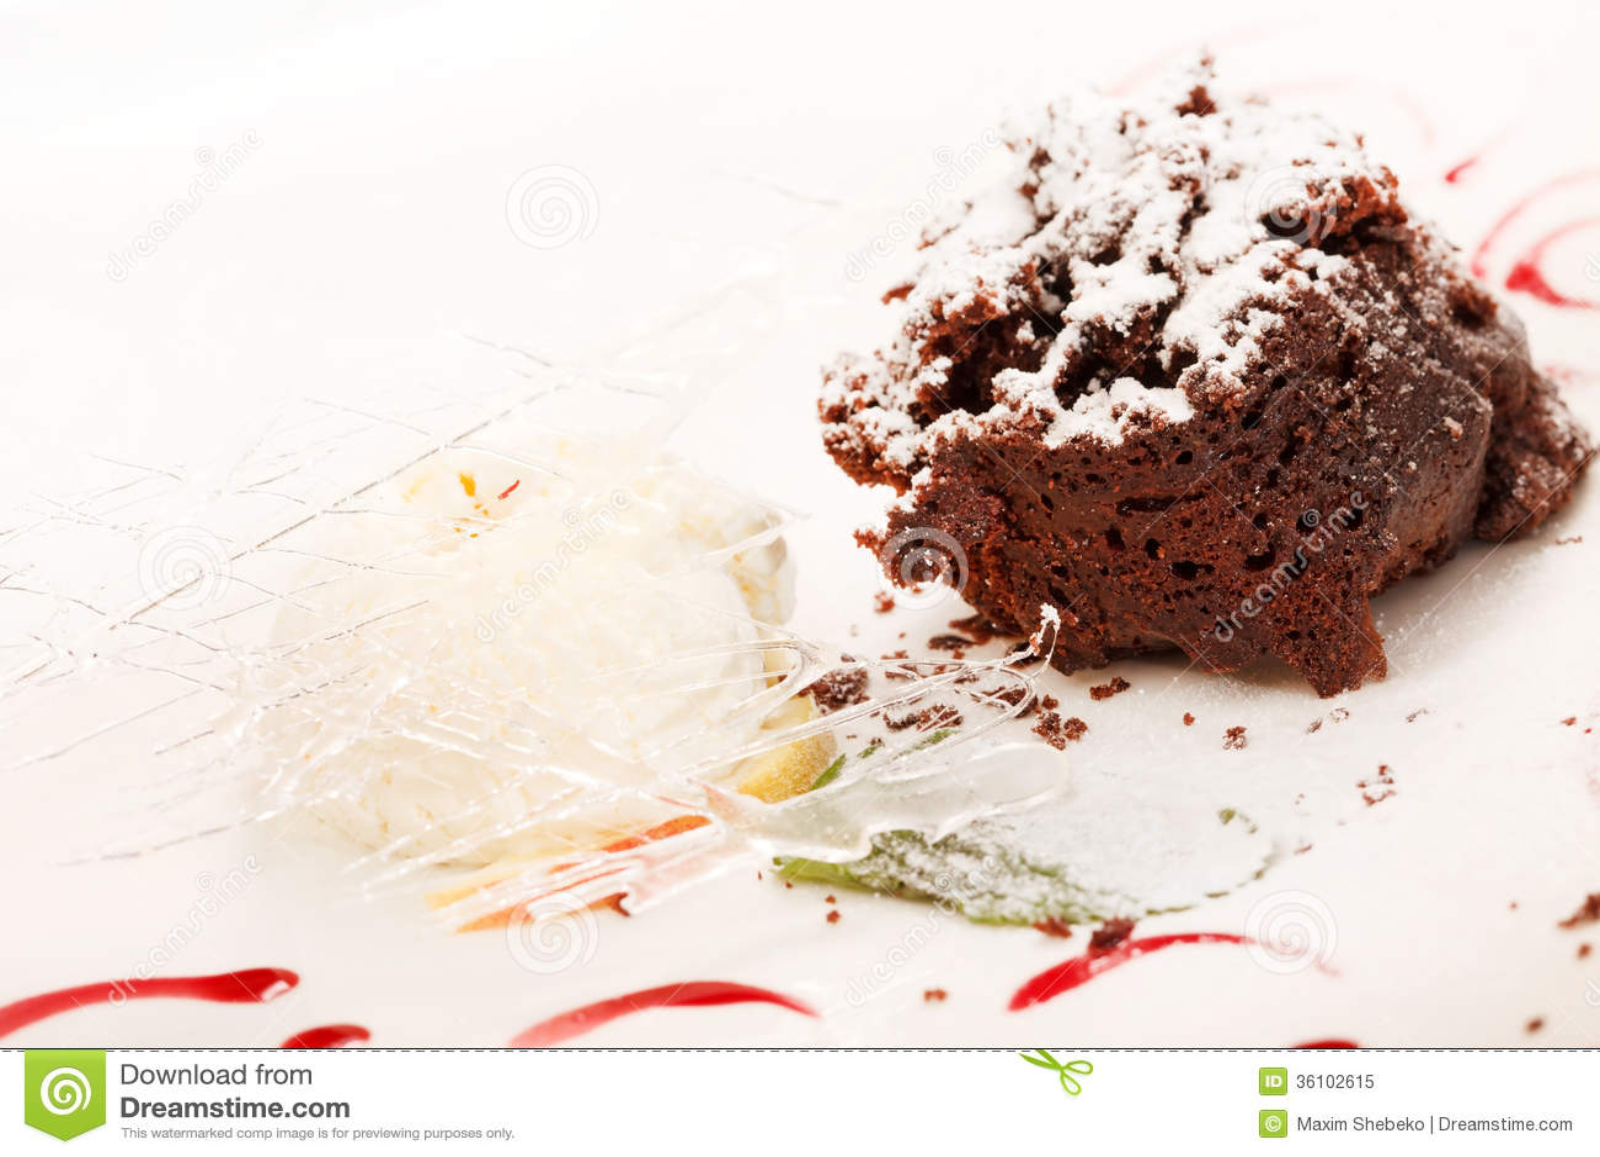 Chocolate Cake Royalty Free Stock Photo - Image: 36102615